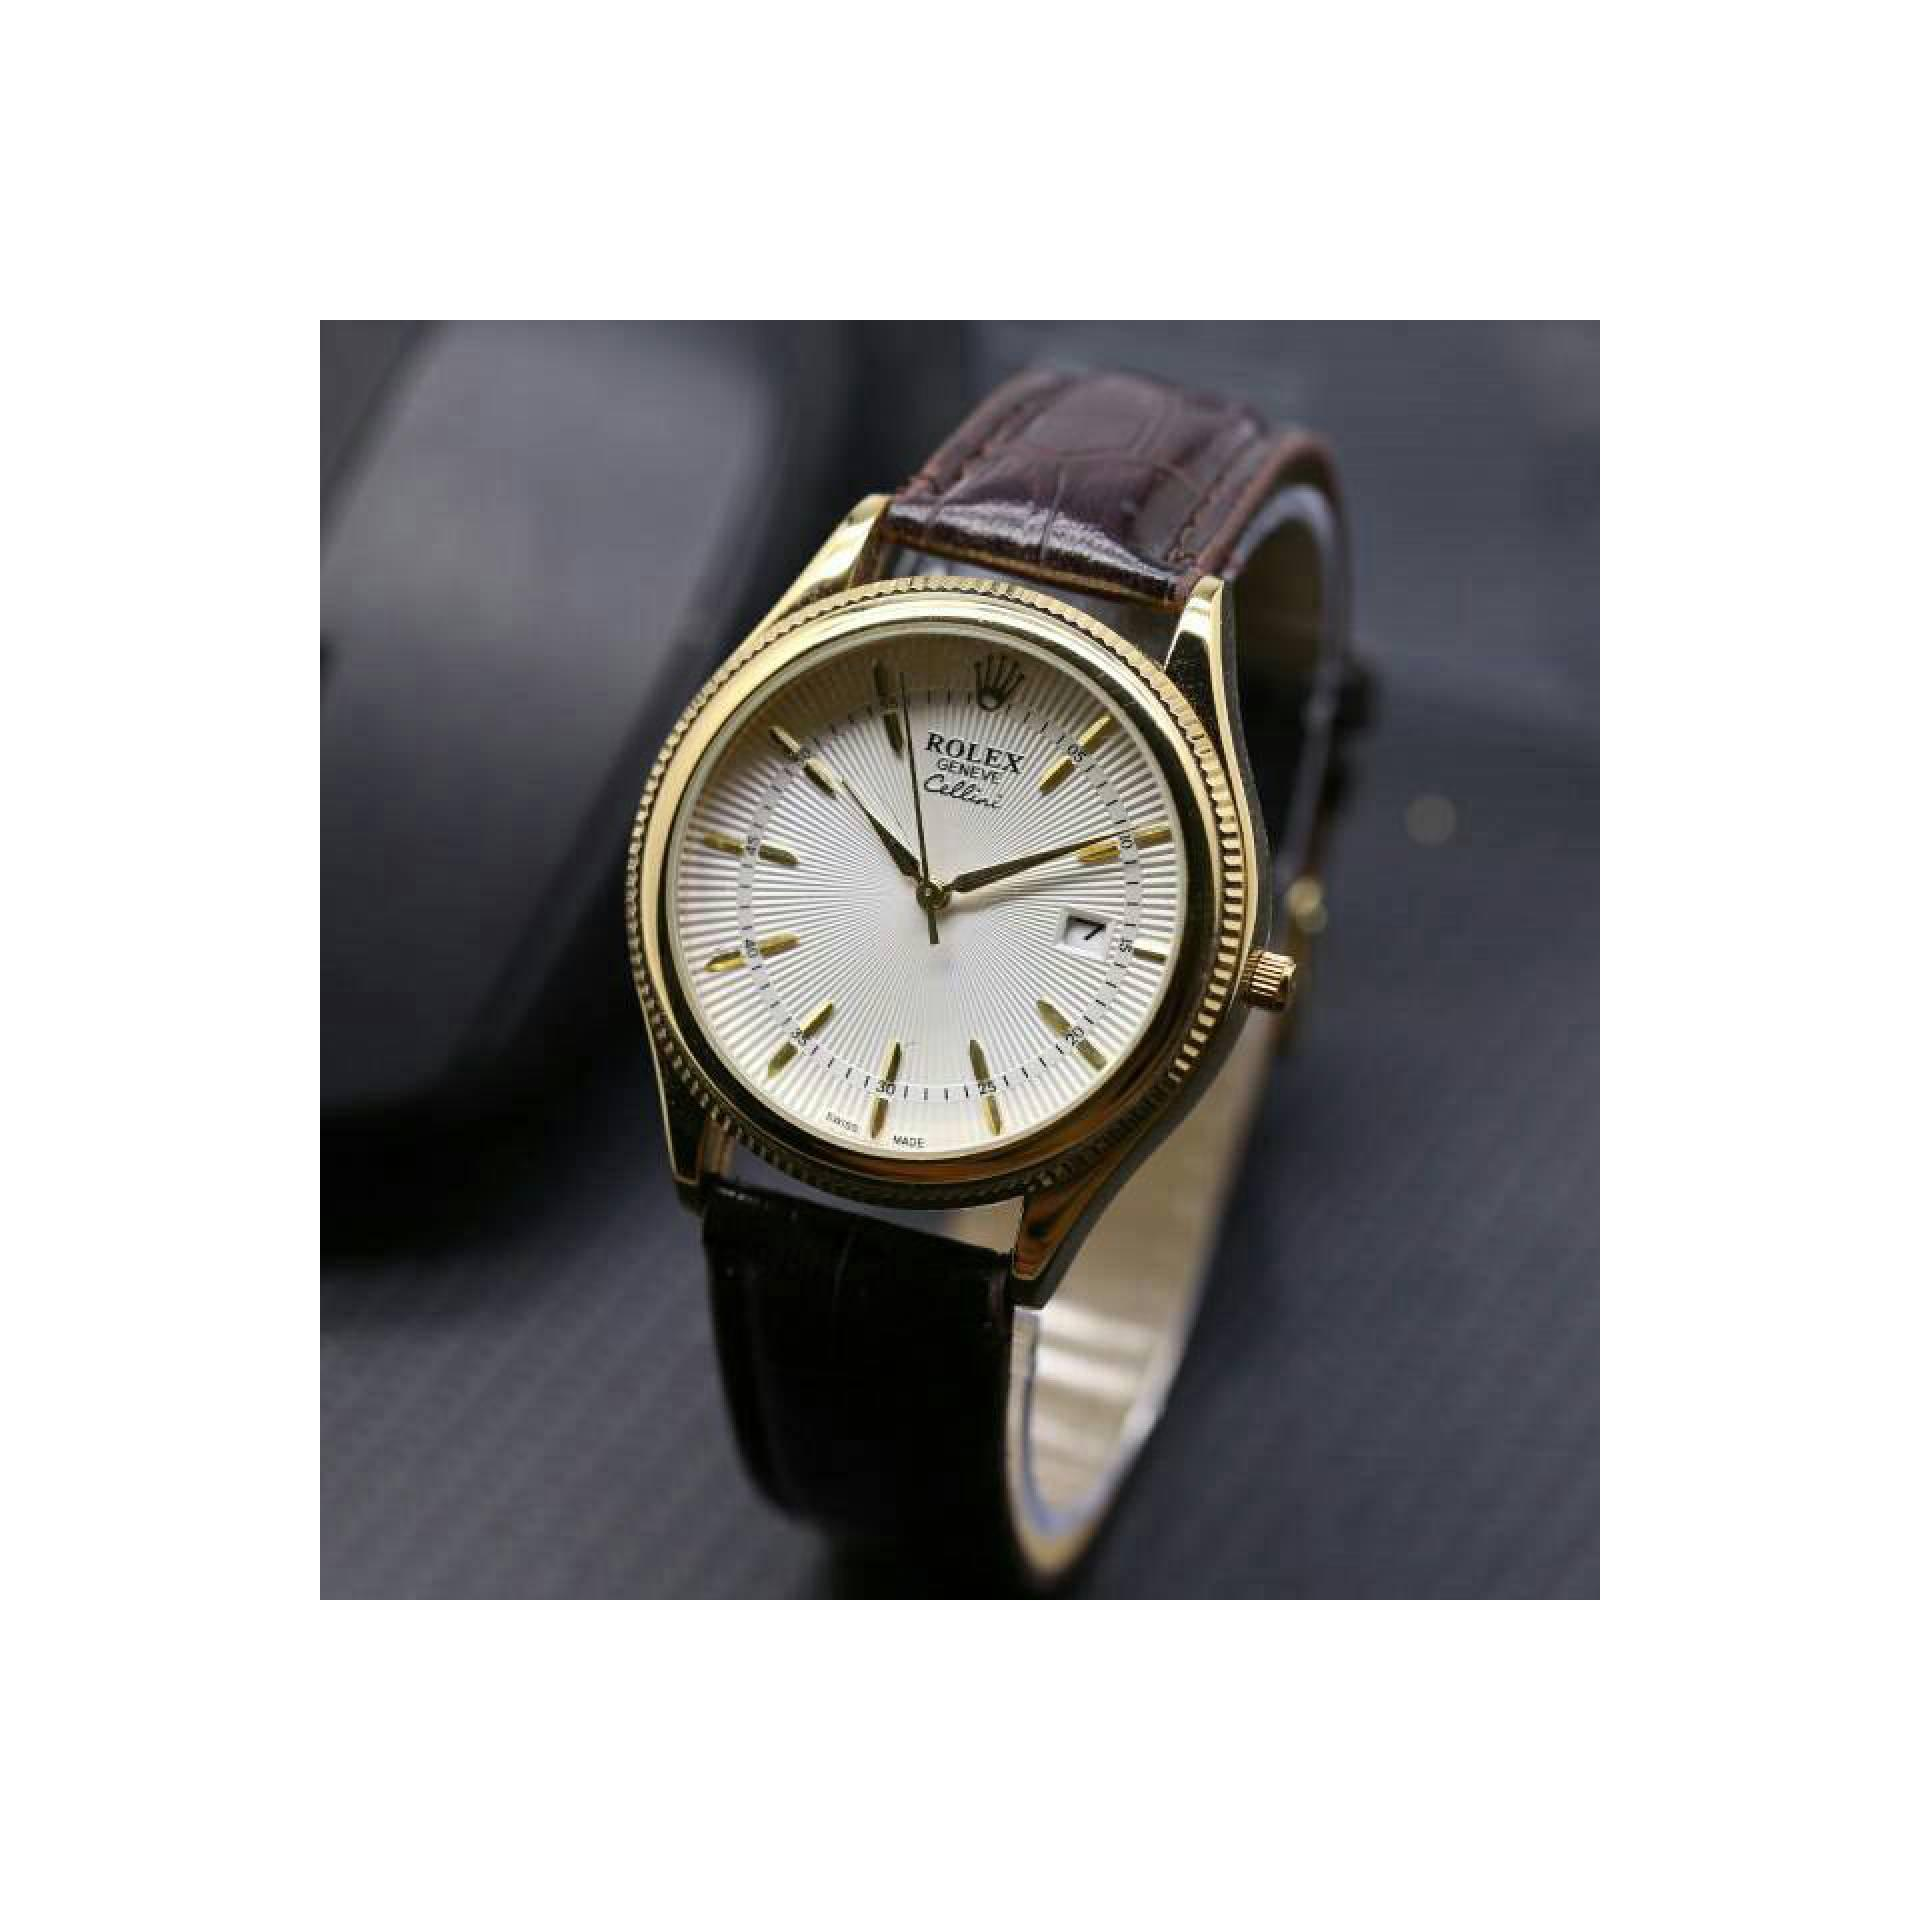 Jam Tangan Unisex Rolex LS1547 - Dark Brown Ring Gold